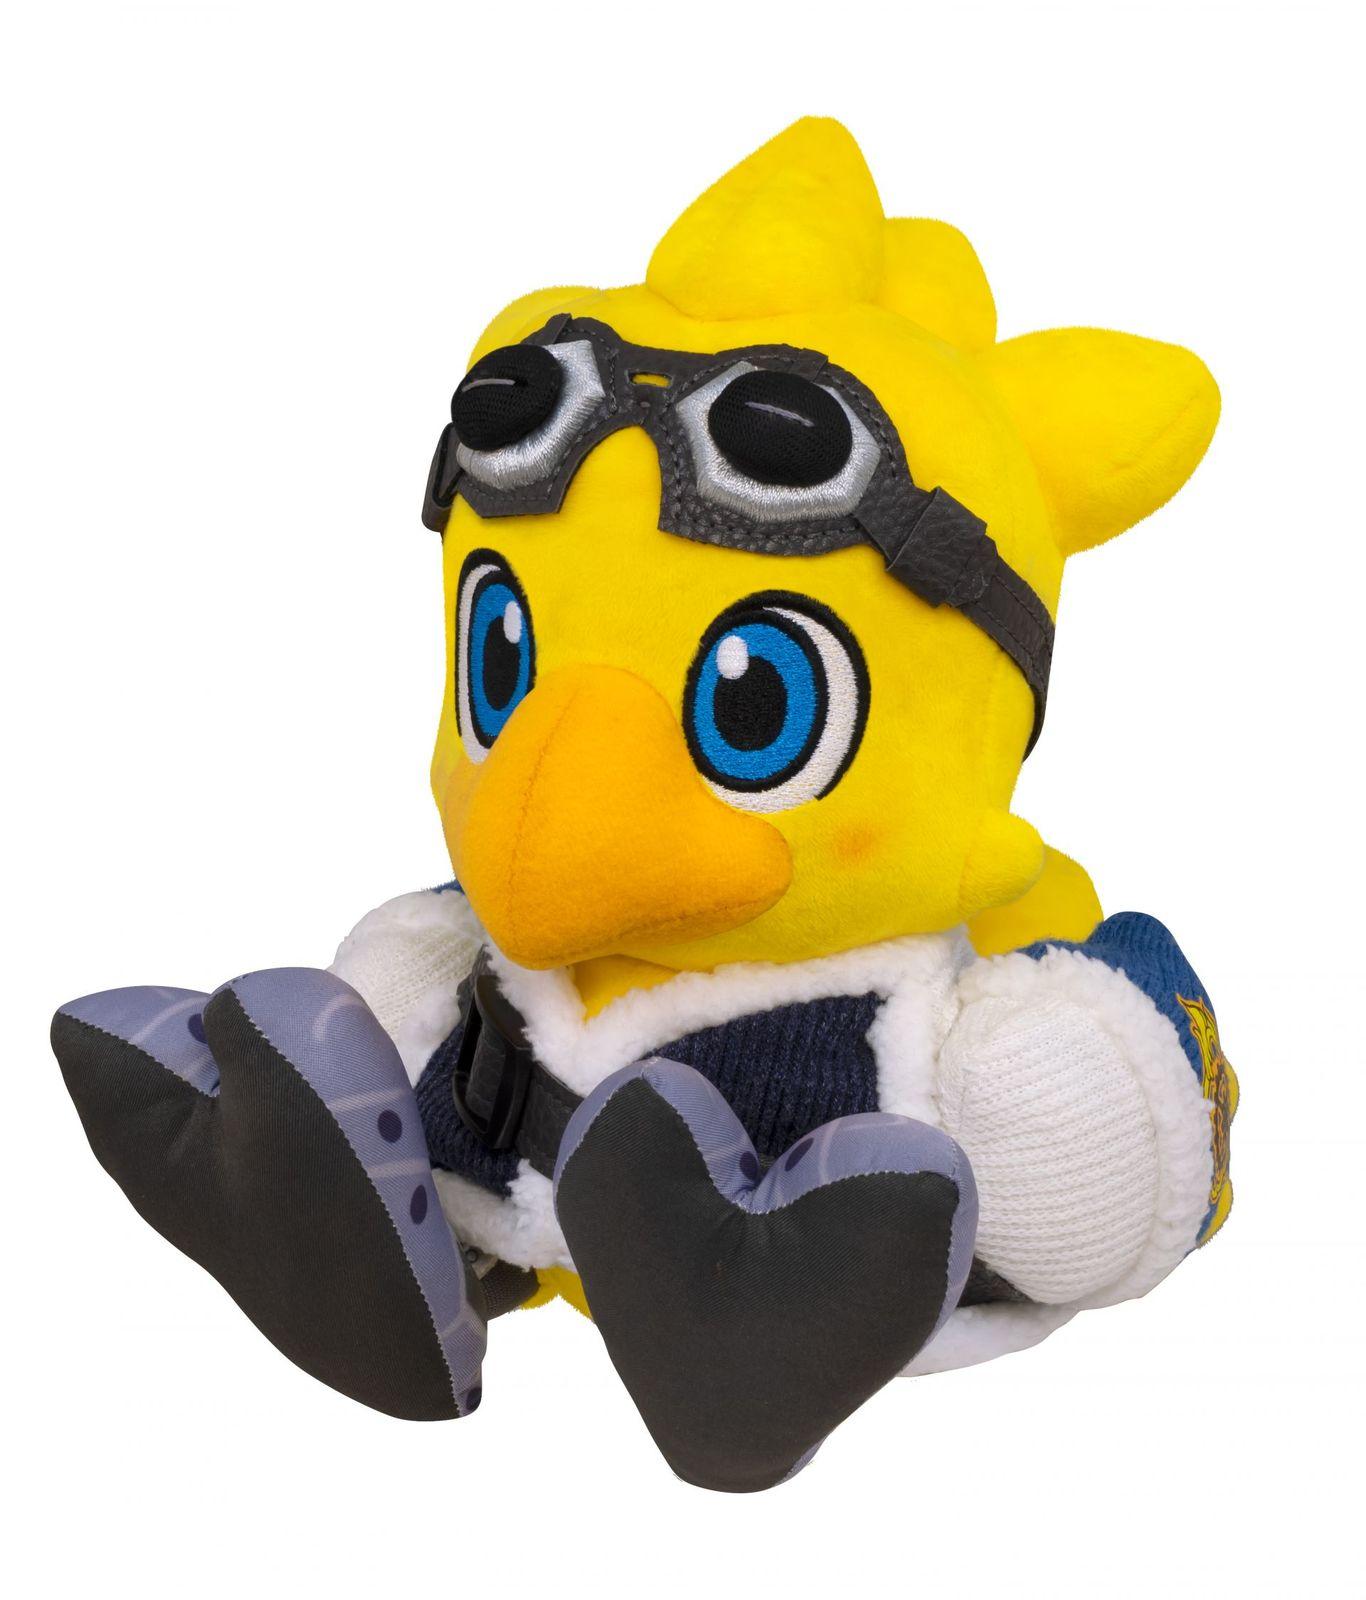 Final Fantasy XIV: Chocobo (Alpha) - Plush Toy image